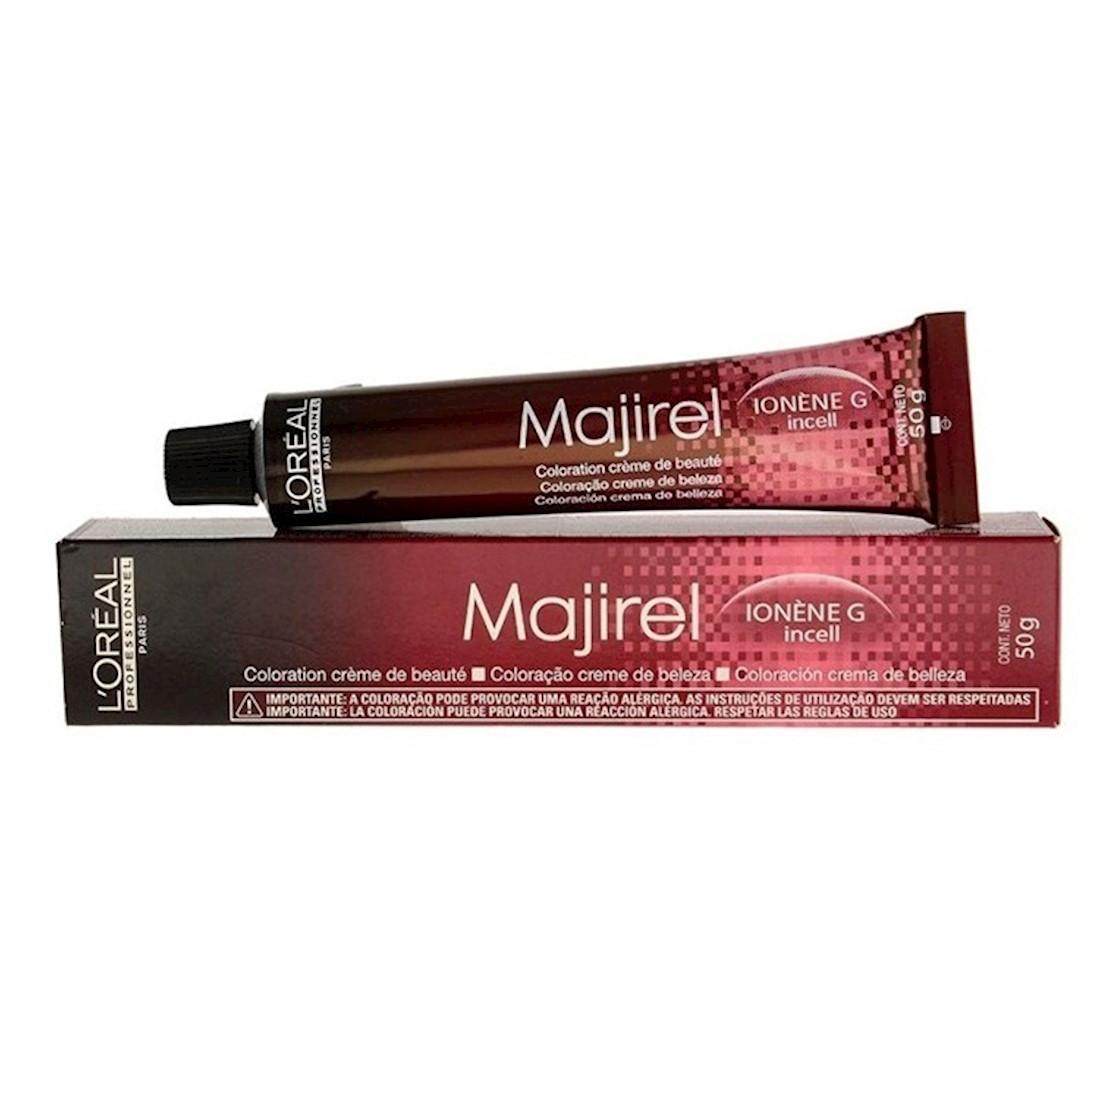 Coloração Majirel 4 (Castanho) da L'Oreal 50g Bisnaga